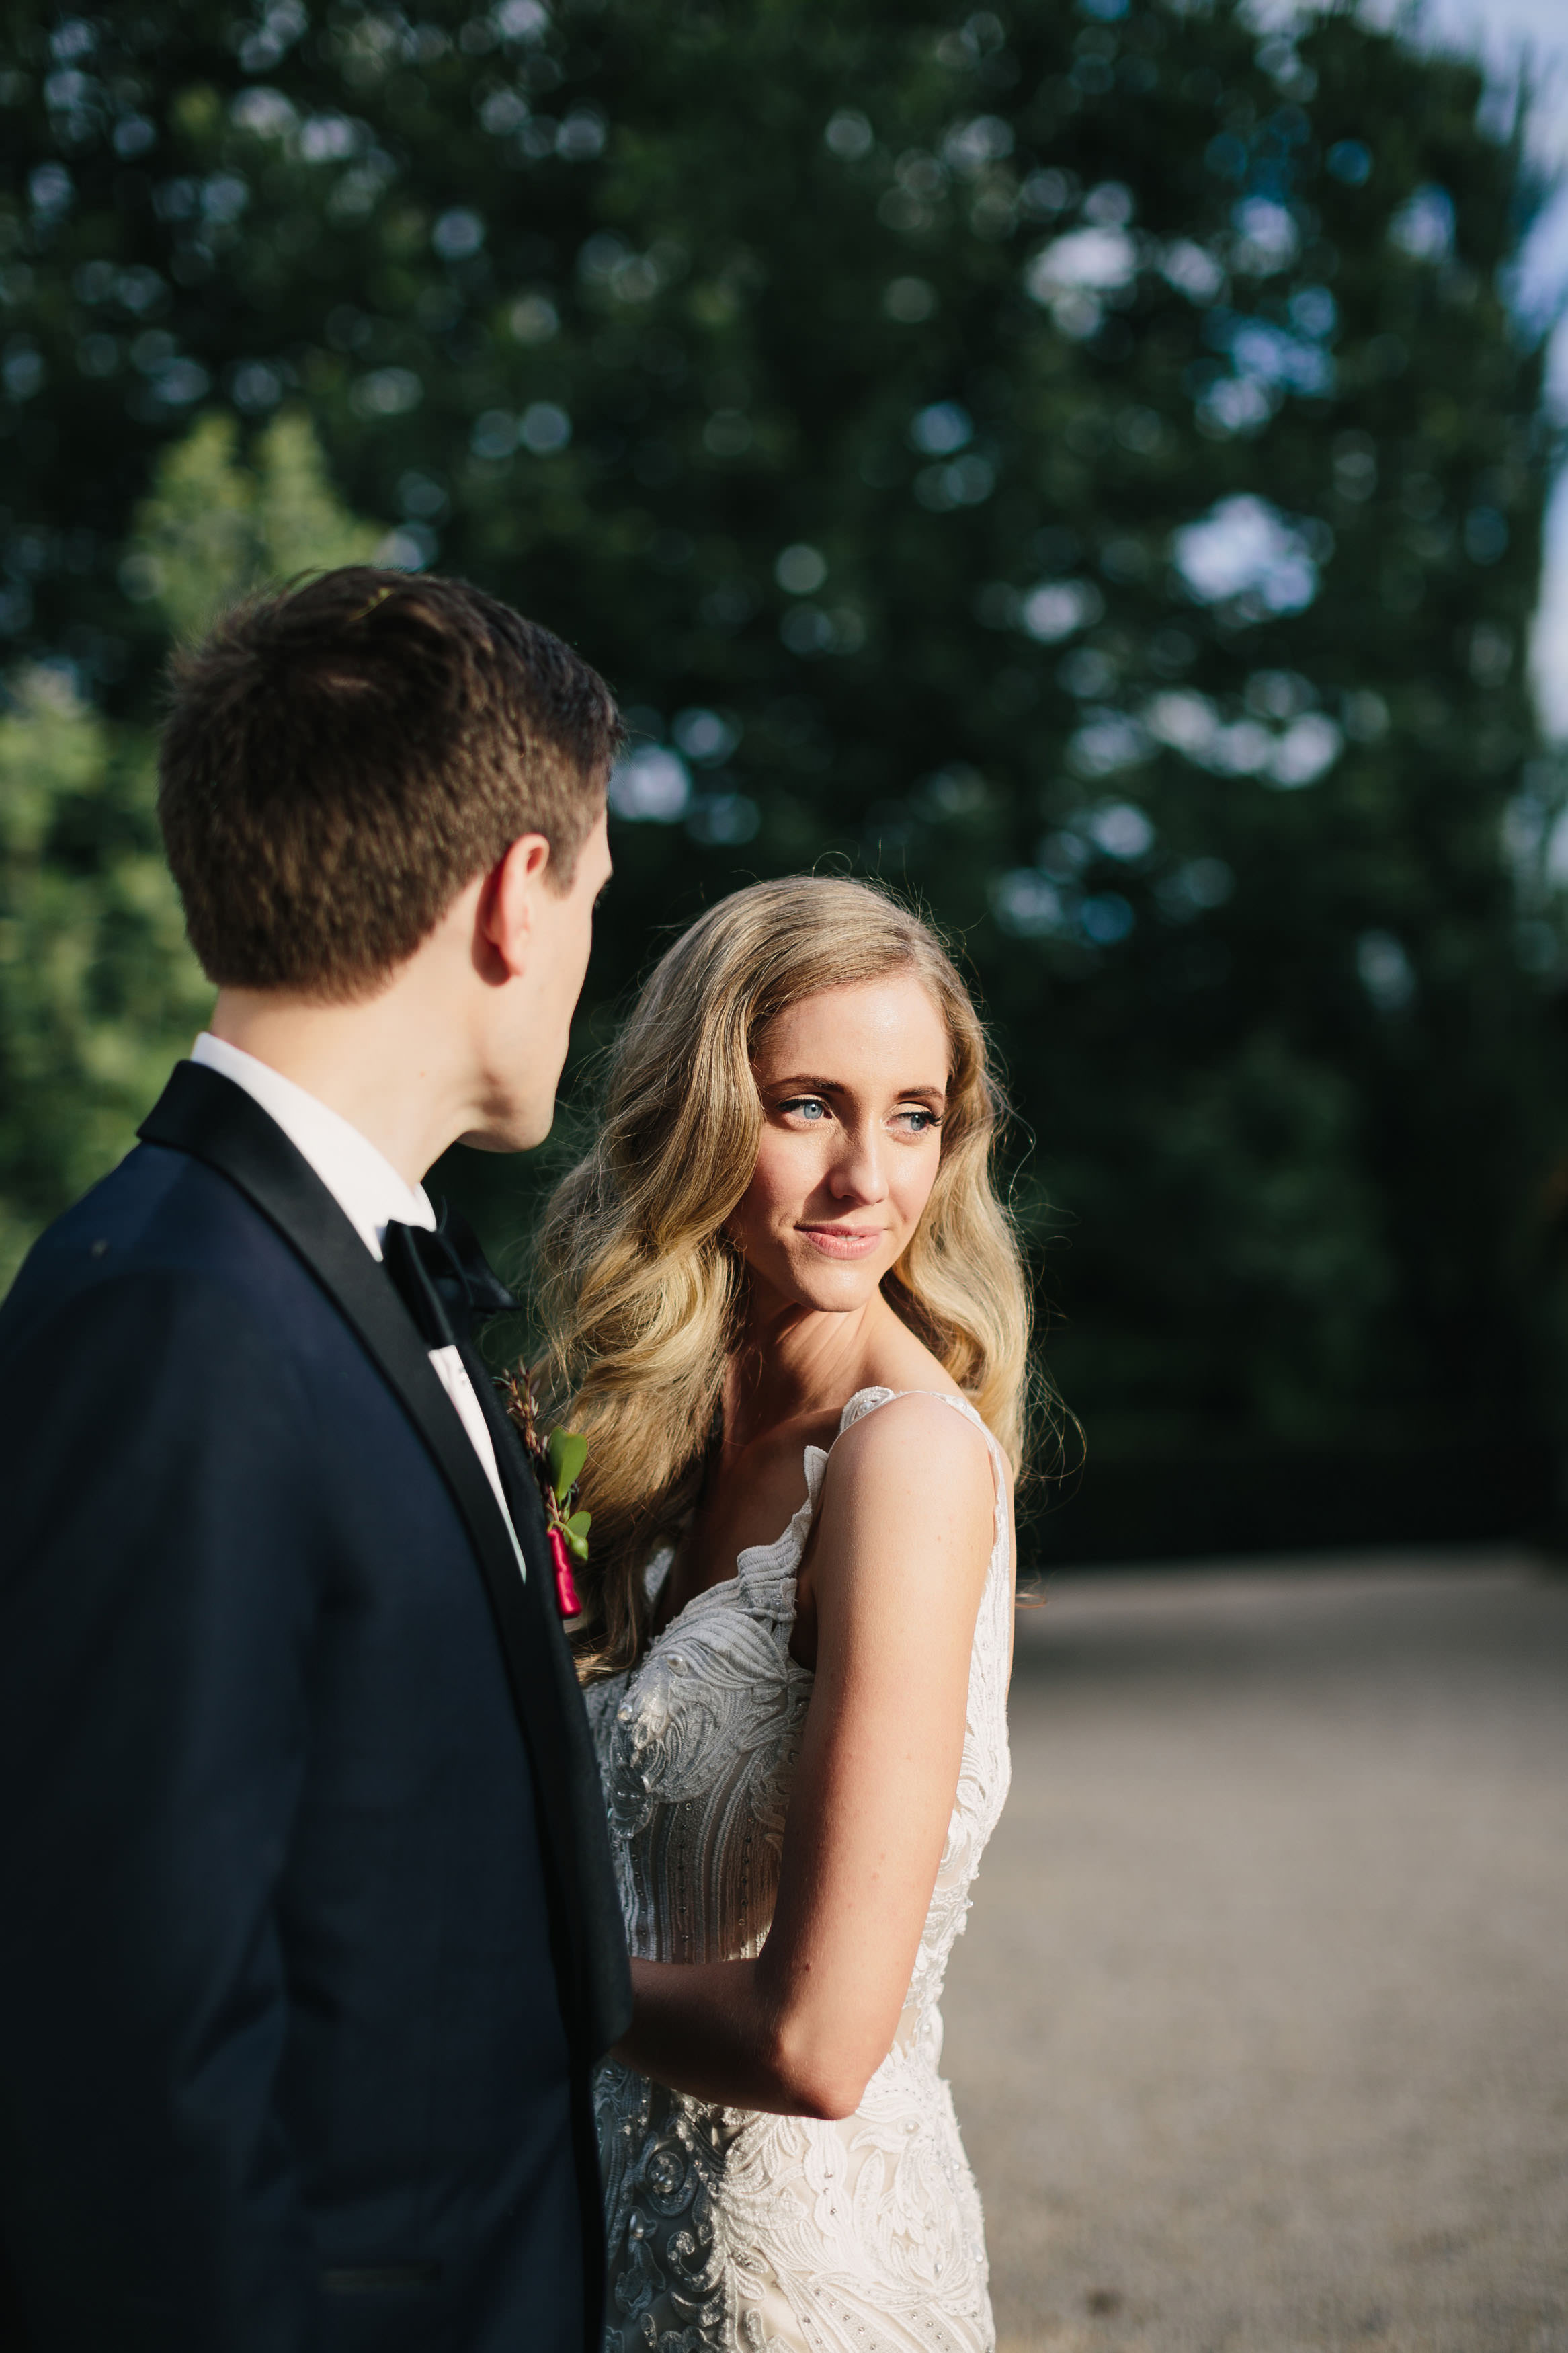 076_hunter_valley_wedding_photography_redleaf_paul_bamford_finchandoak.jpg